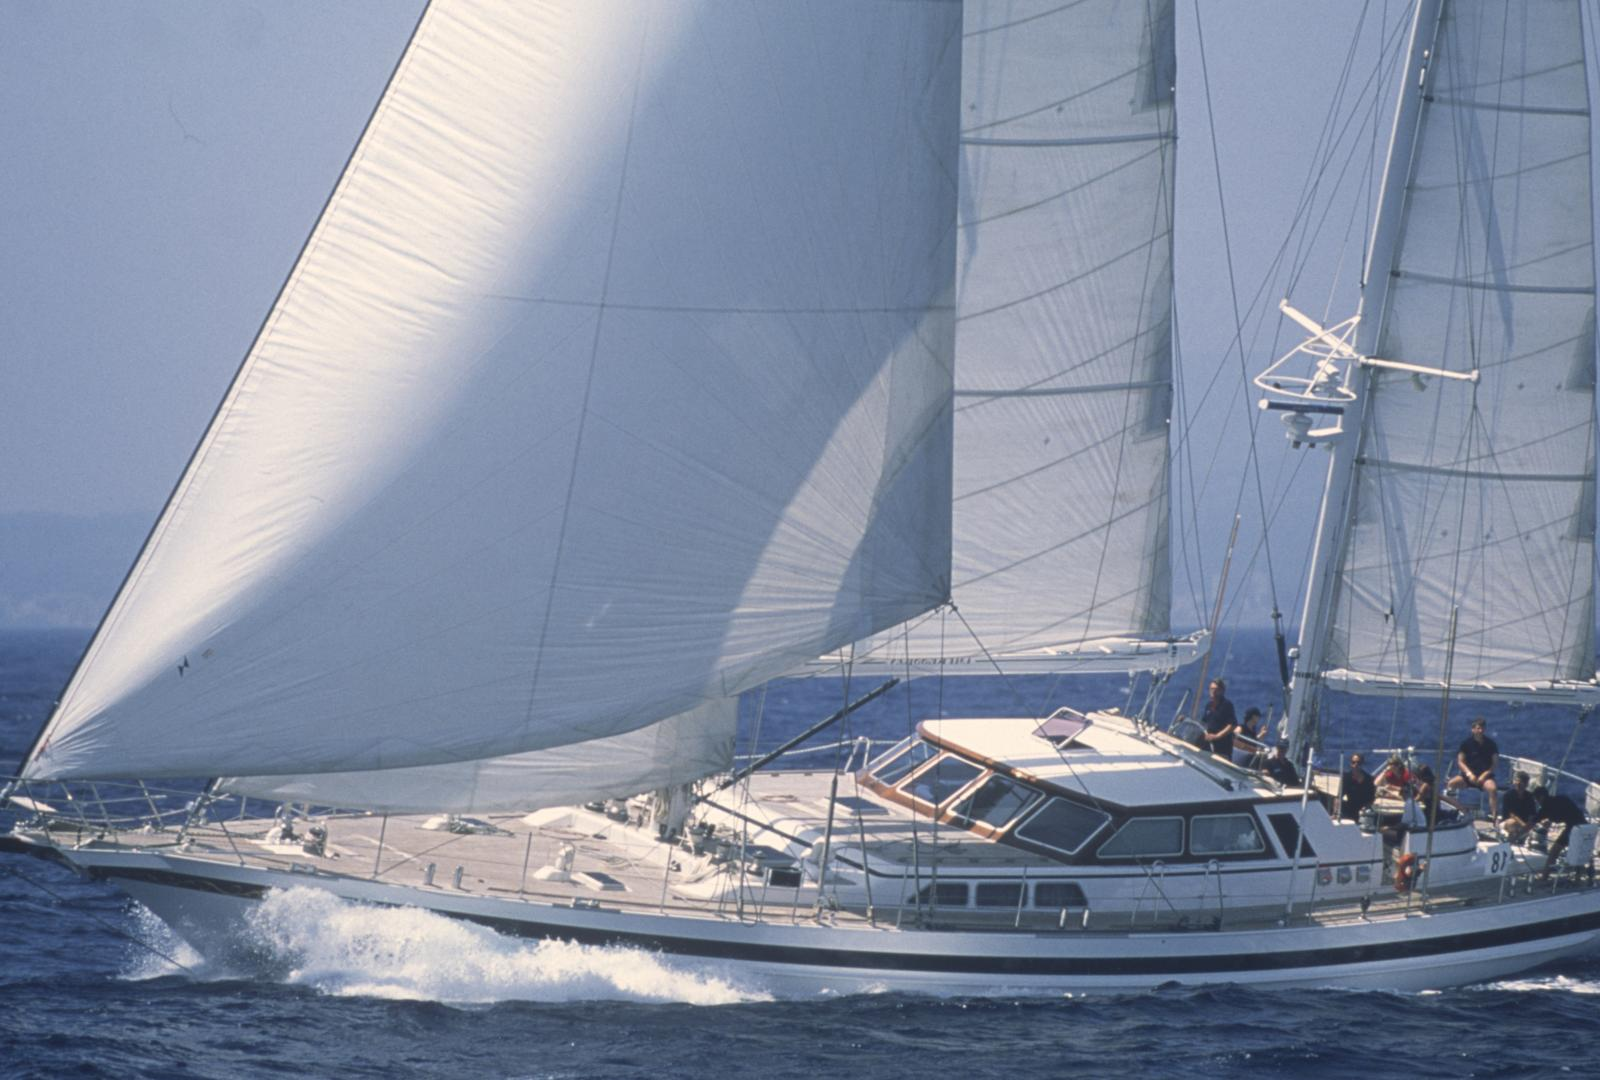 Coming Soon sailing yacht Jongert 30T ketch Impression for sale at Van der Vliet Dutch Quality Yachts